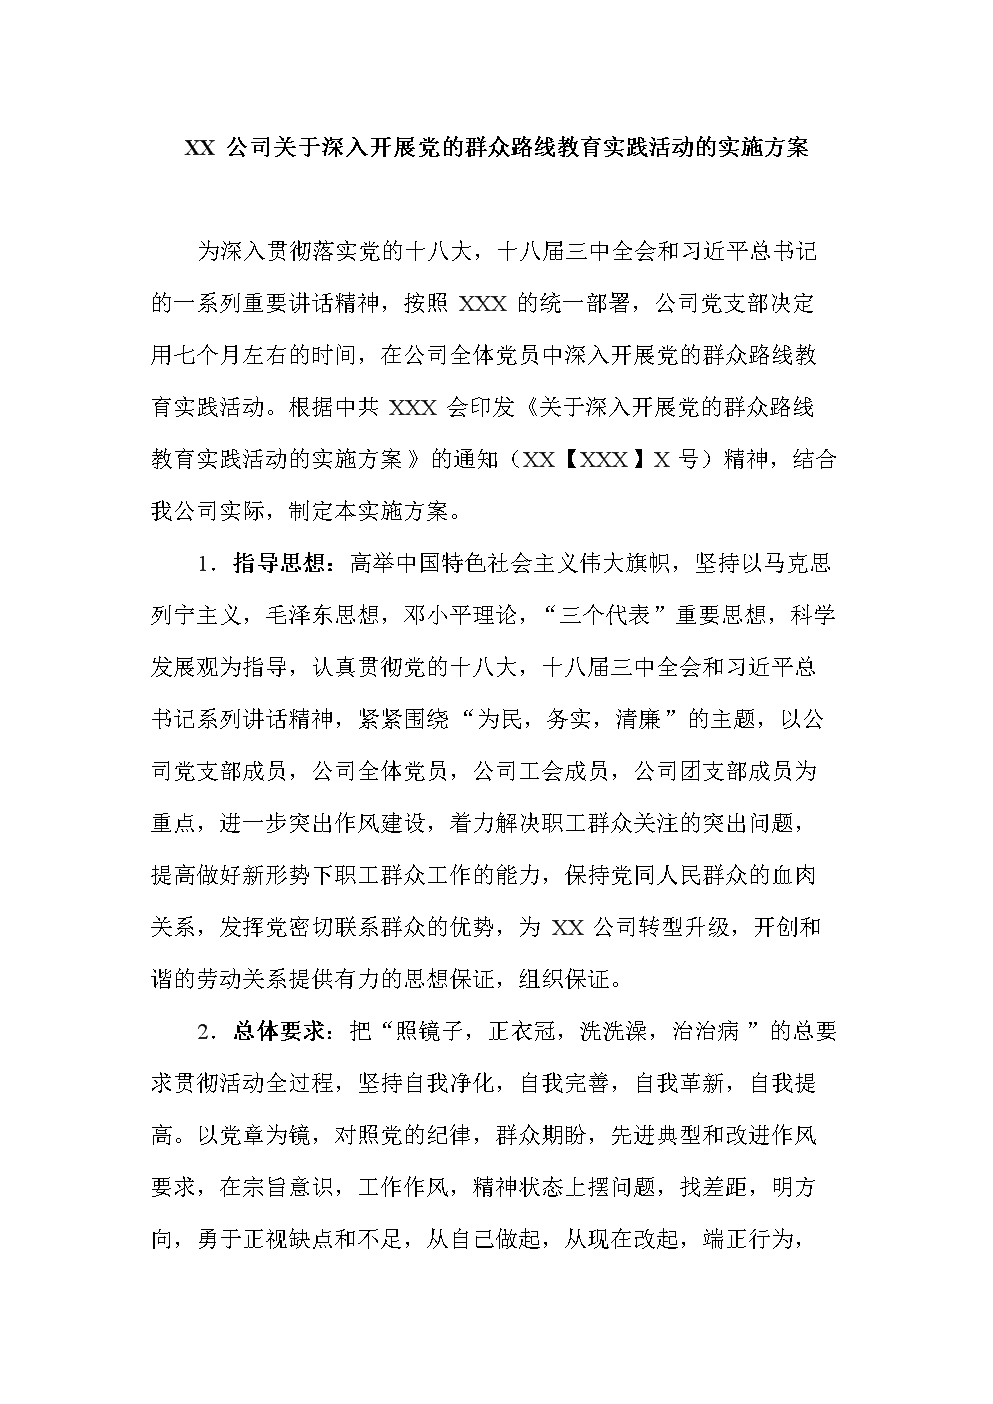 XX公司关于深入开展党的群众路线教育实践活动的实施方案.doc